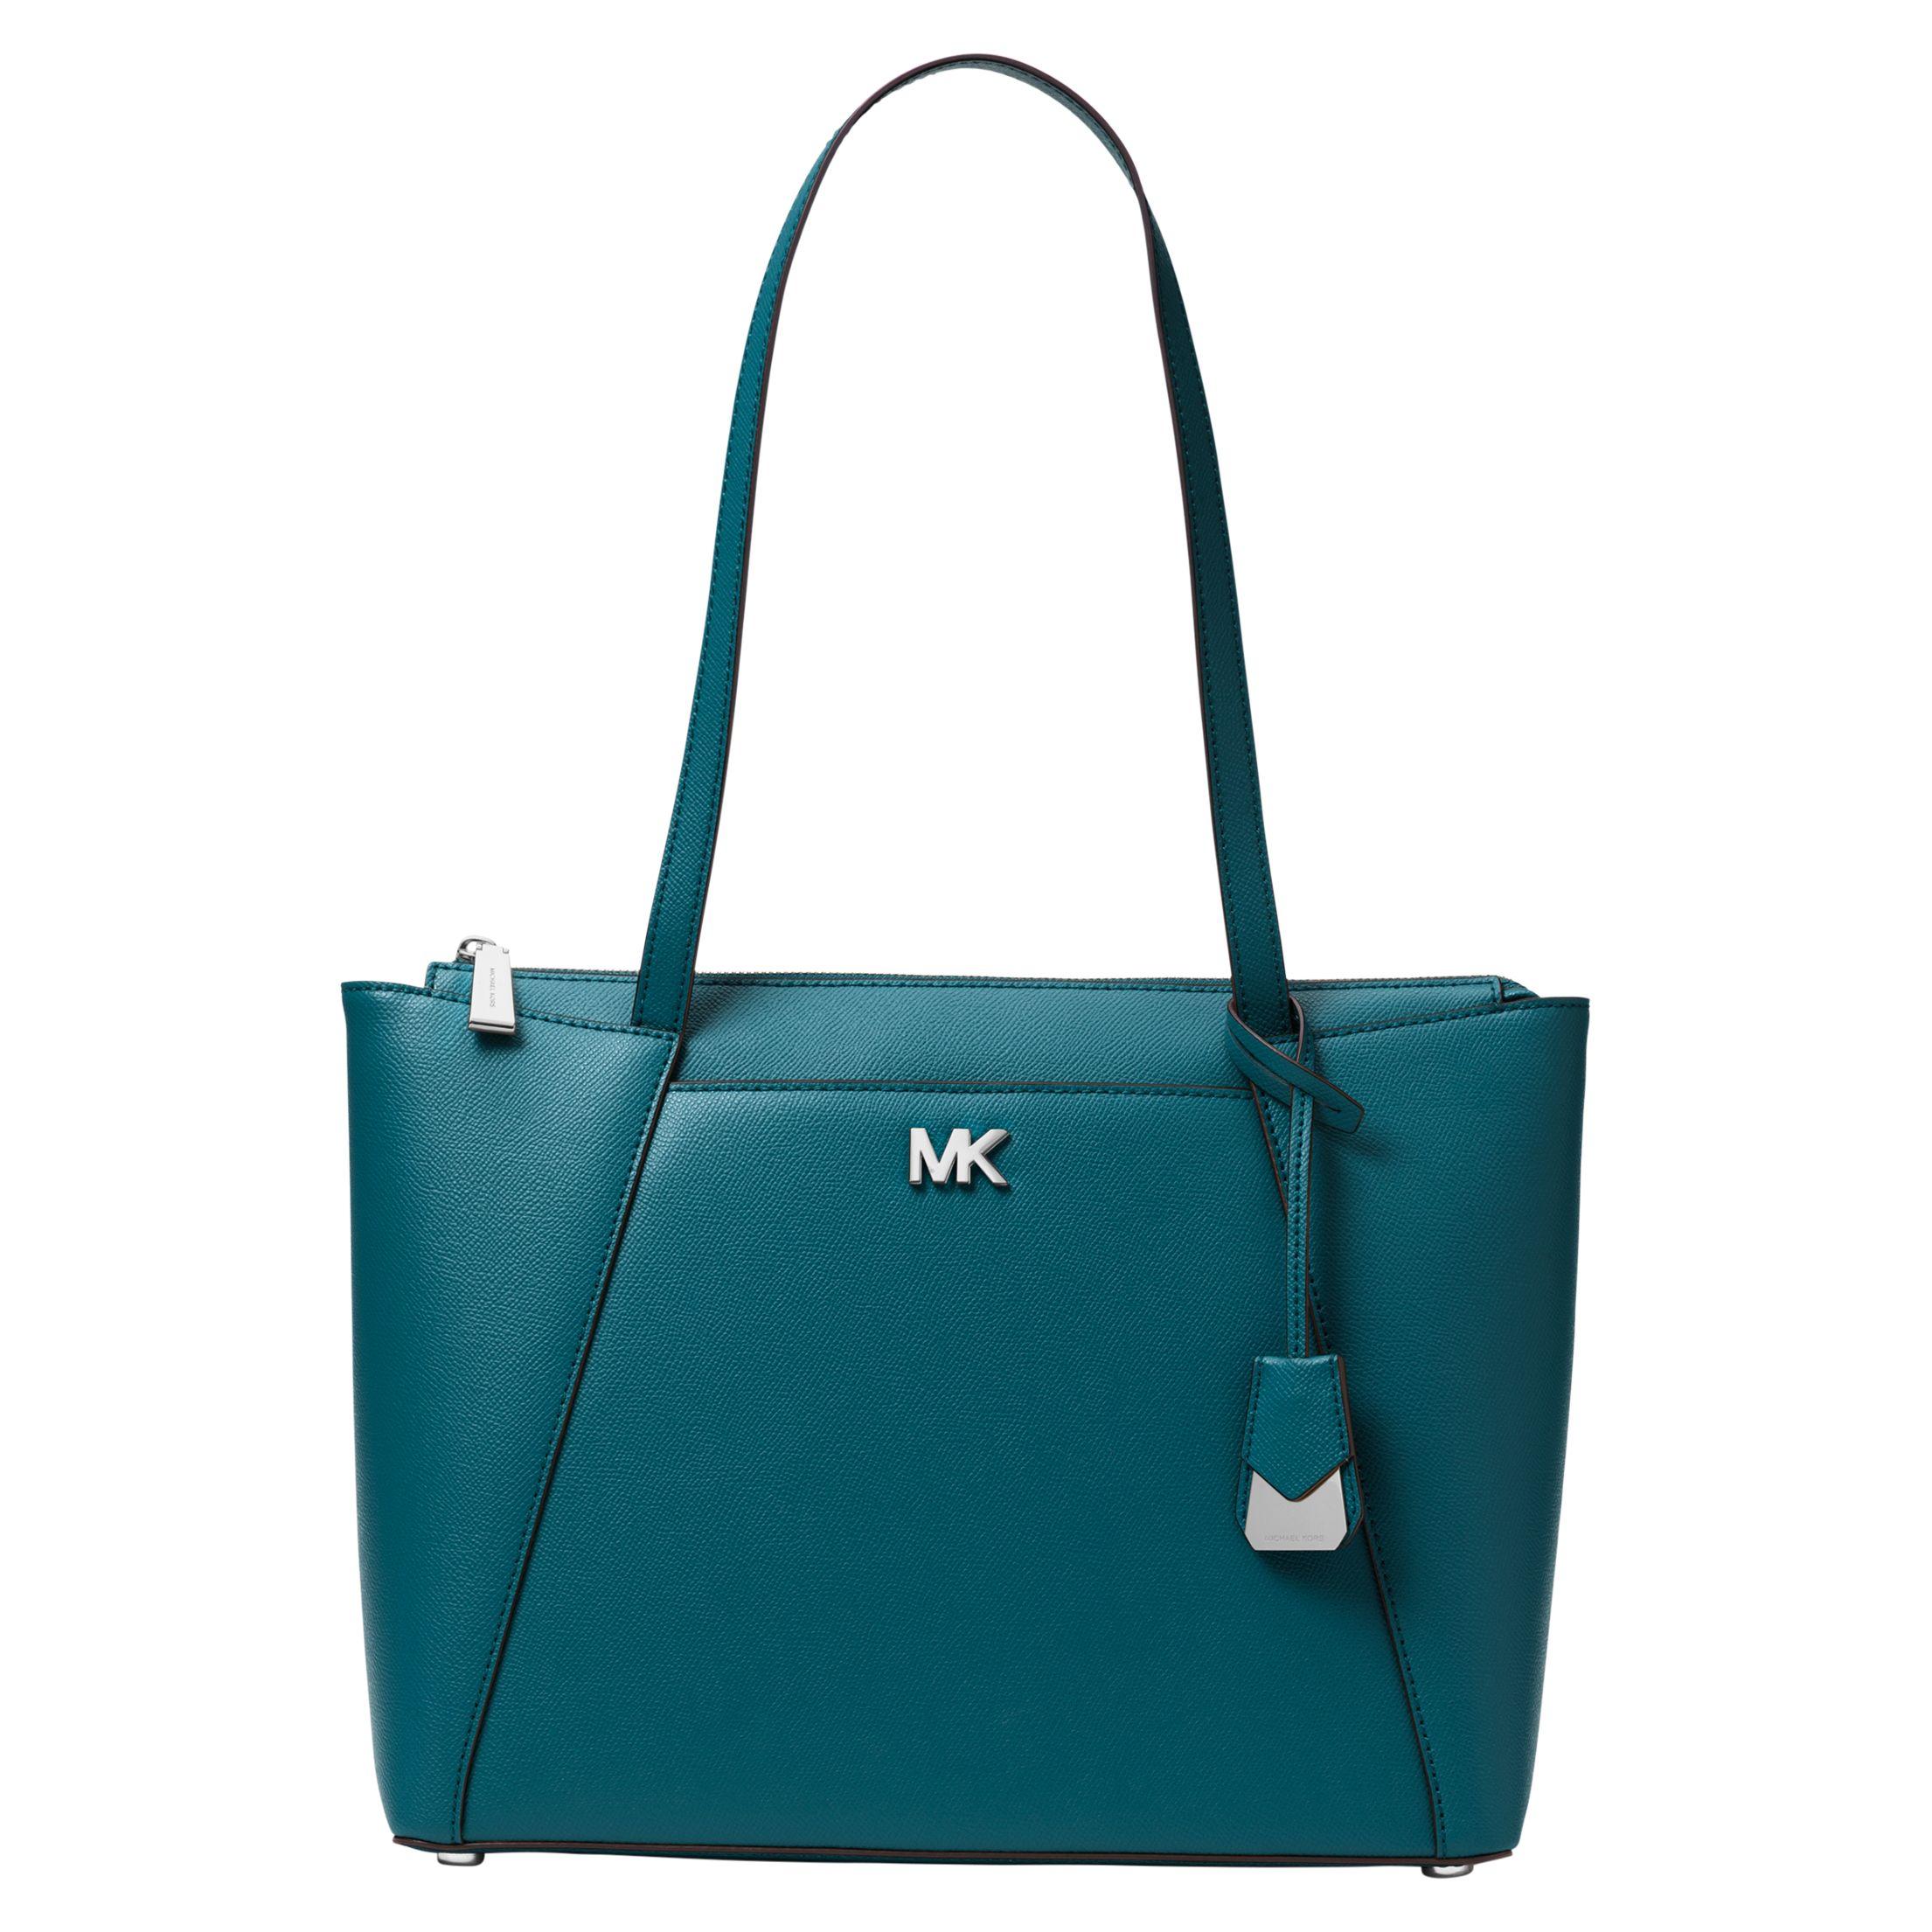 65bda5701580 MICHAEL Michael Kors Maddie East West Medium Leather Tote Bag at John Lewis  & Partners